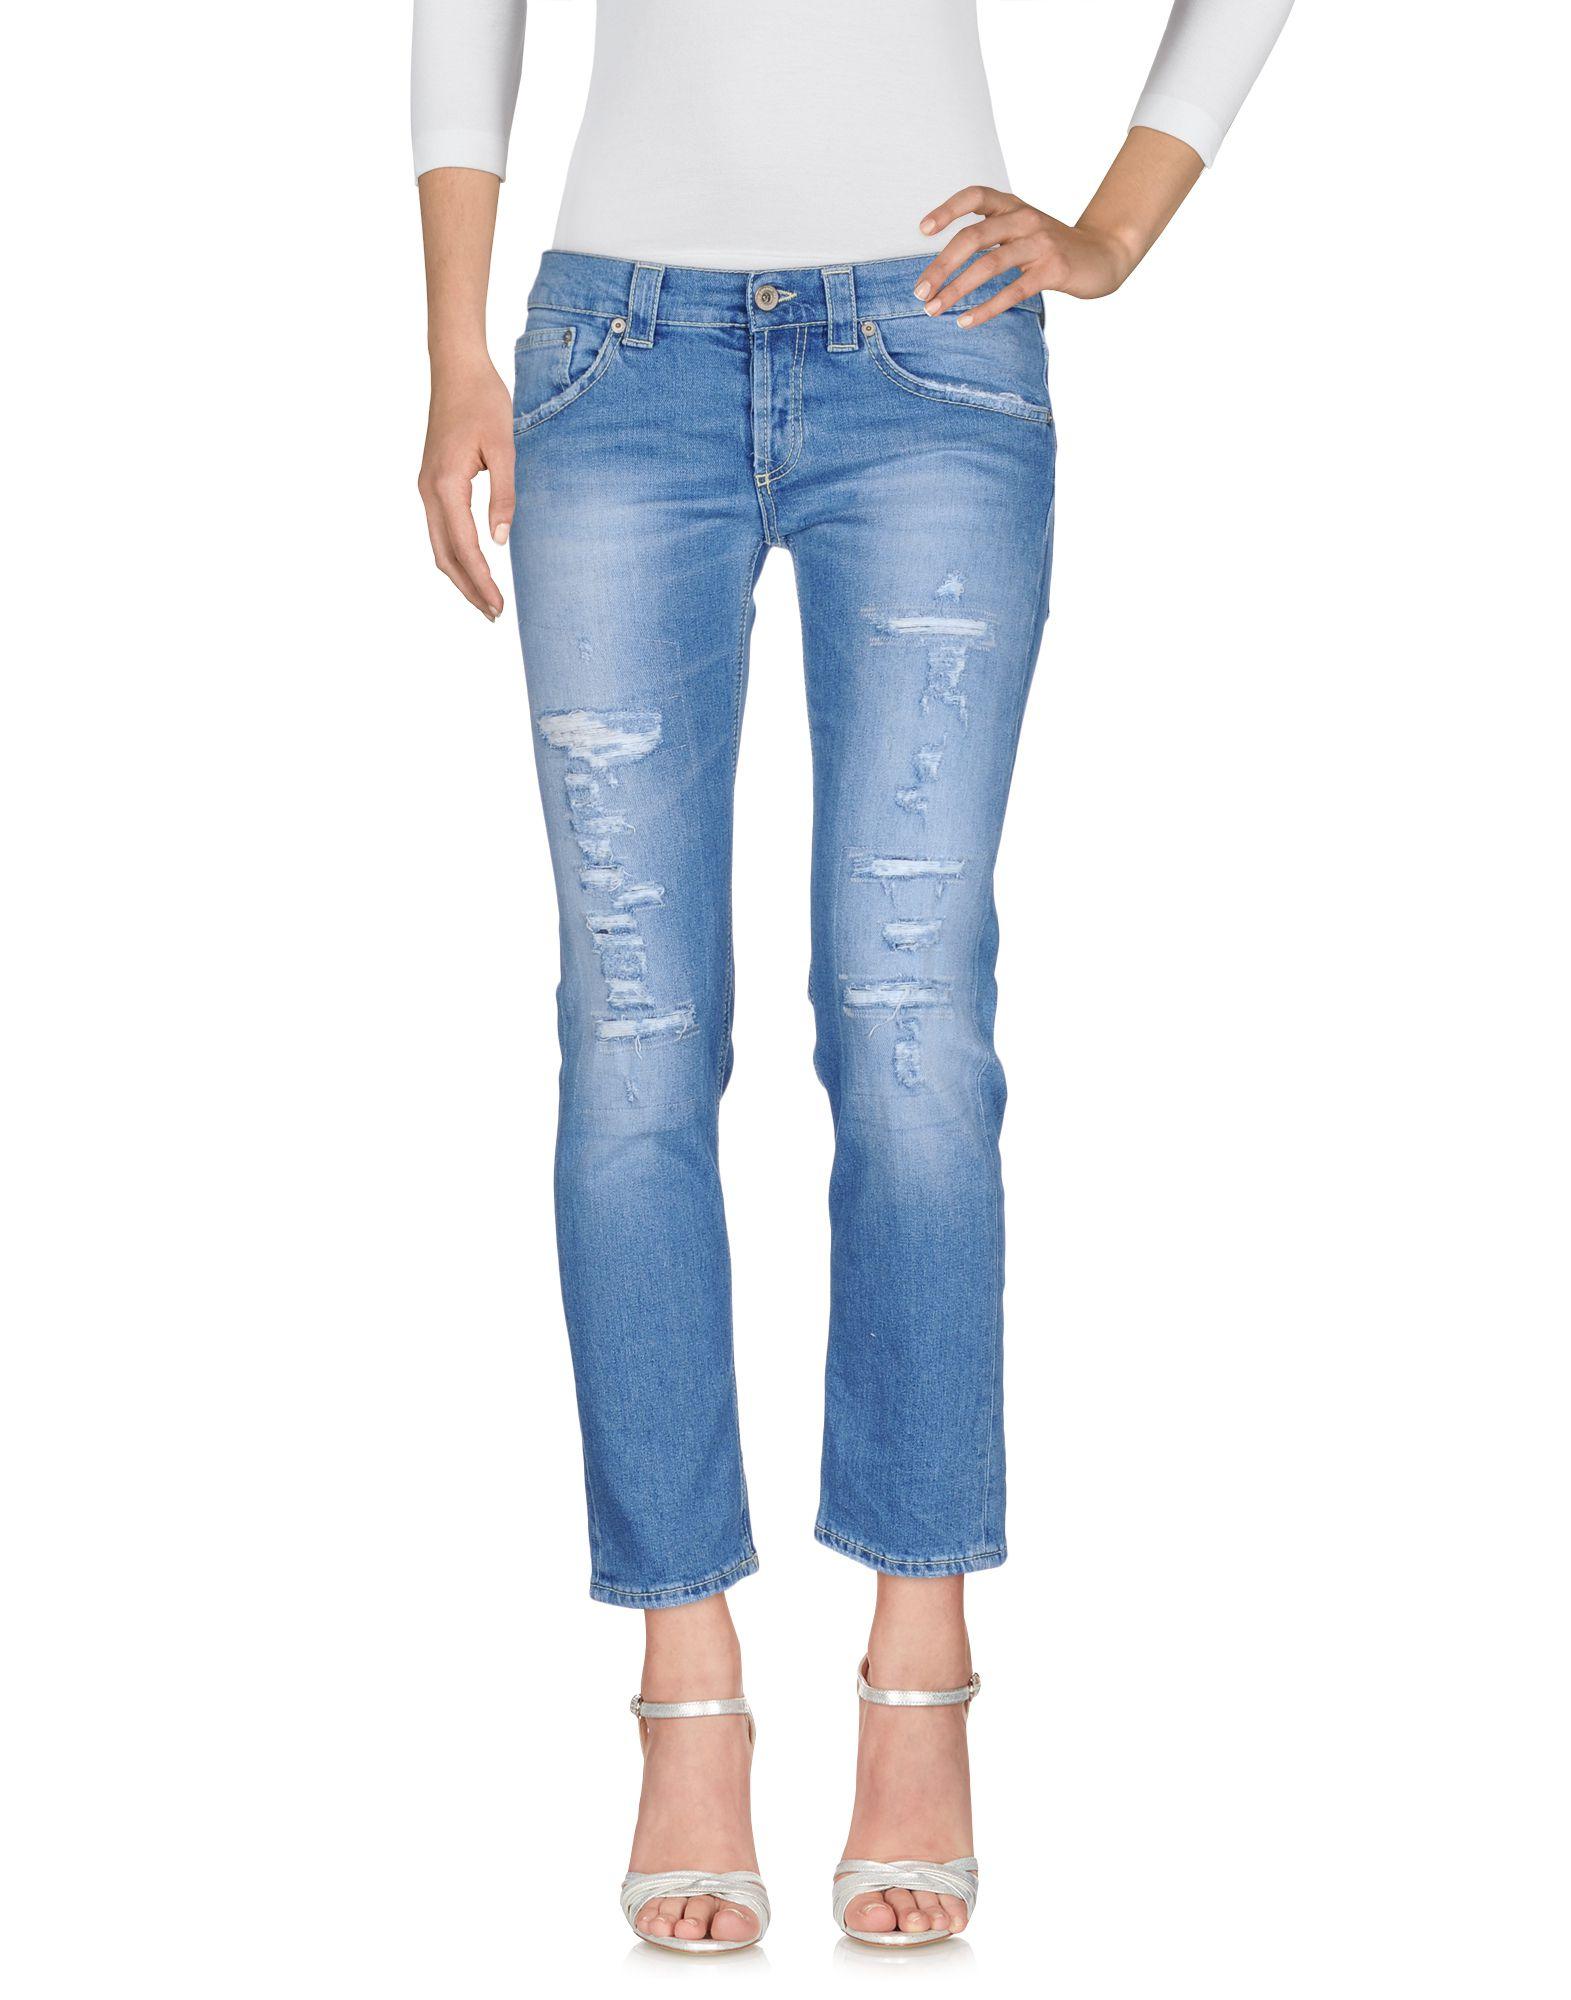 Pantaloni Jeans Dondup Donna - Acquista online su 8H18J